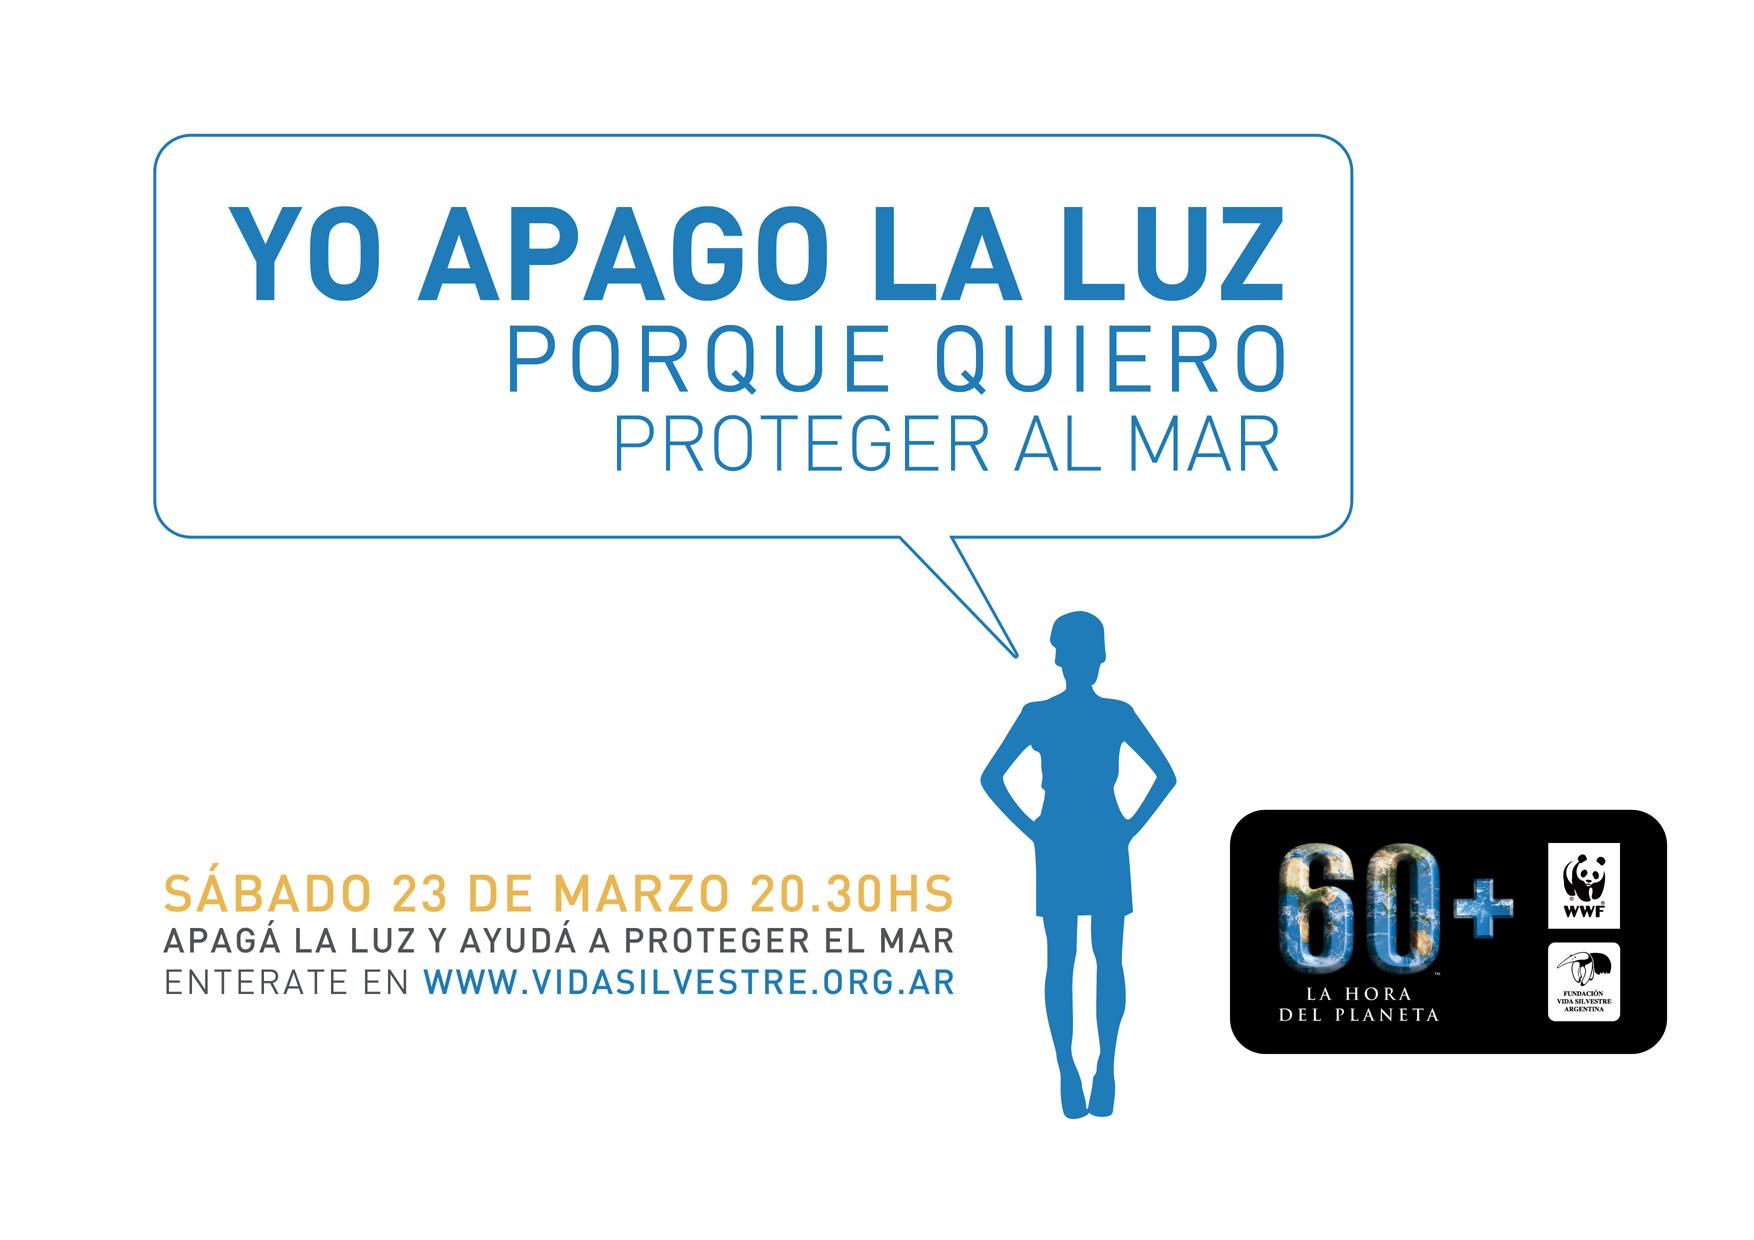 http://awsassets.wwfar.panda.org/downloads/cartel_mujer_baja.jpg